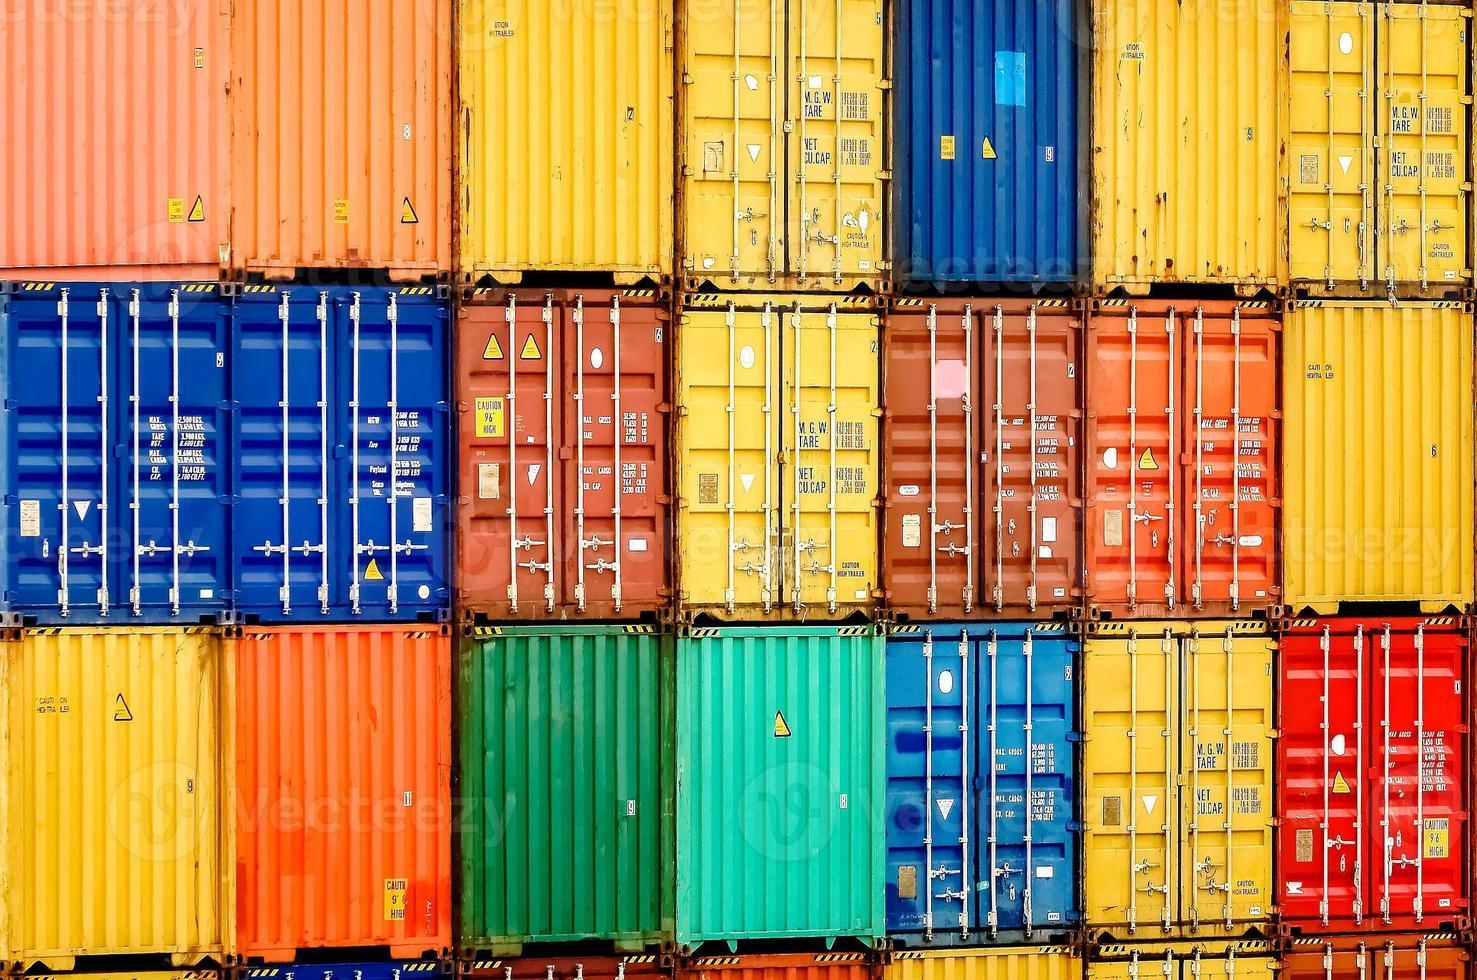 Frachtcontainer foto